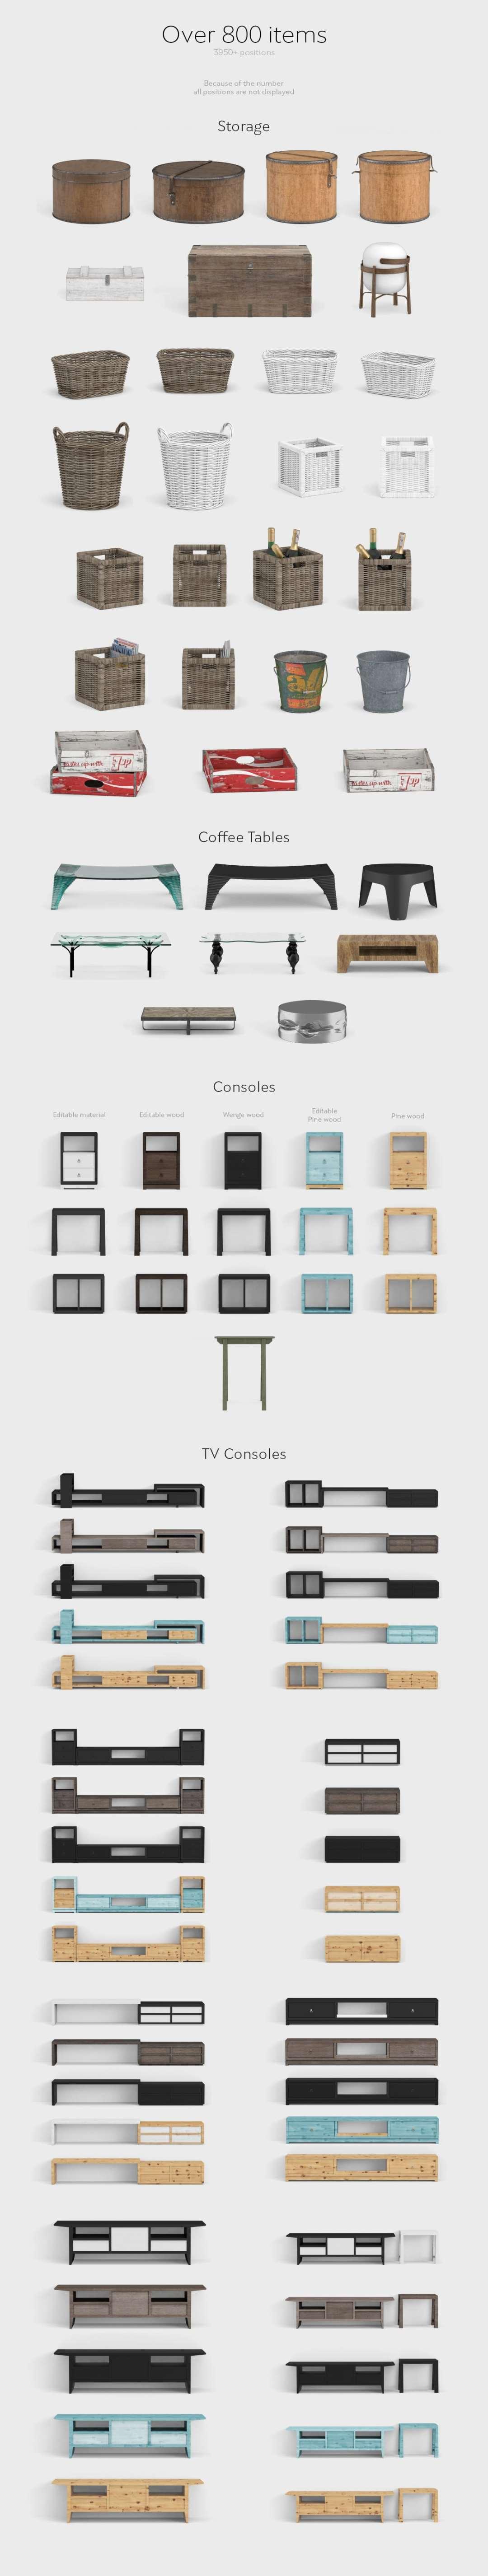 creative-market-scene-creator-bundle-21